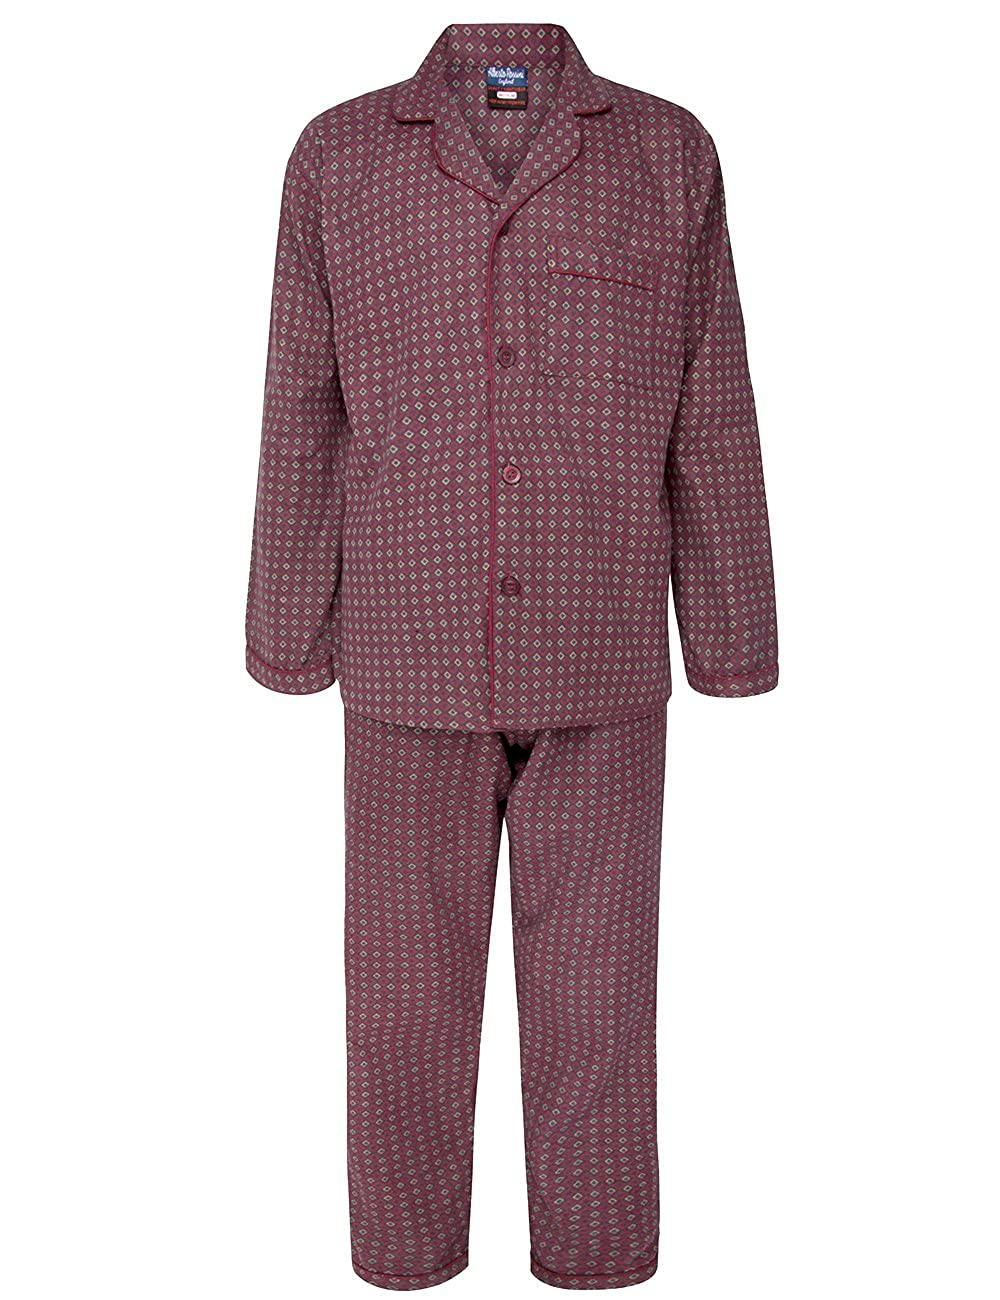 Alberto Rossini Mens Winter Winceyette Flannel Pyjamas Brushed Cotton Nighwear Sizes M to XXl